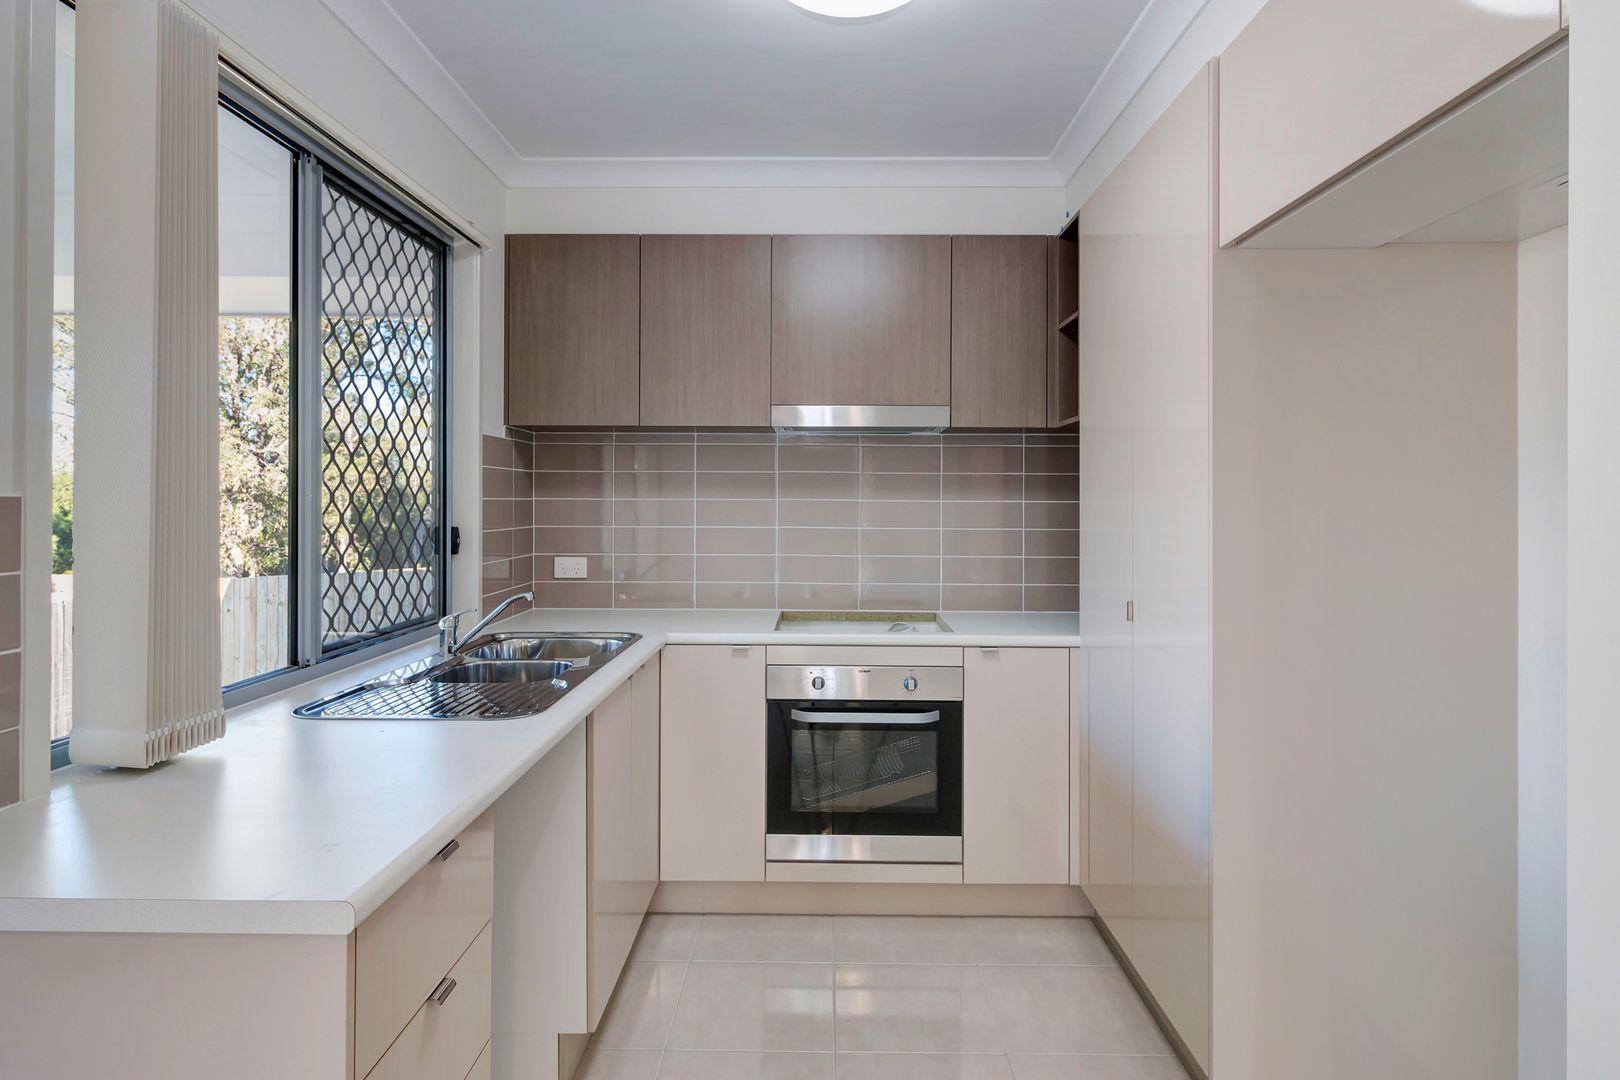 1/13 Ceres Street, Wulkuraka QLD 4305, Image 1